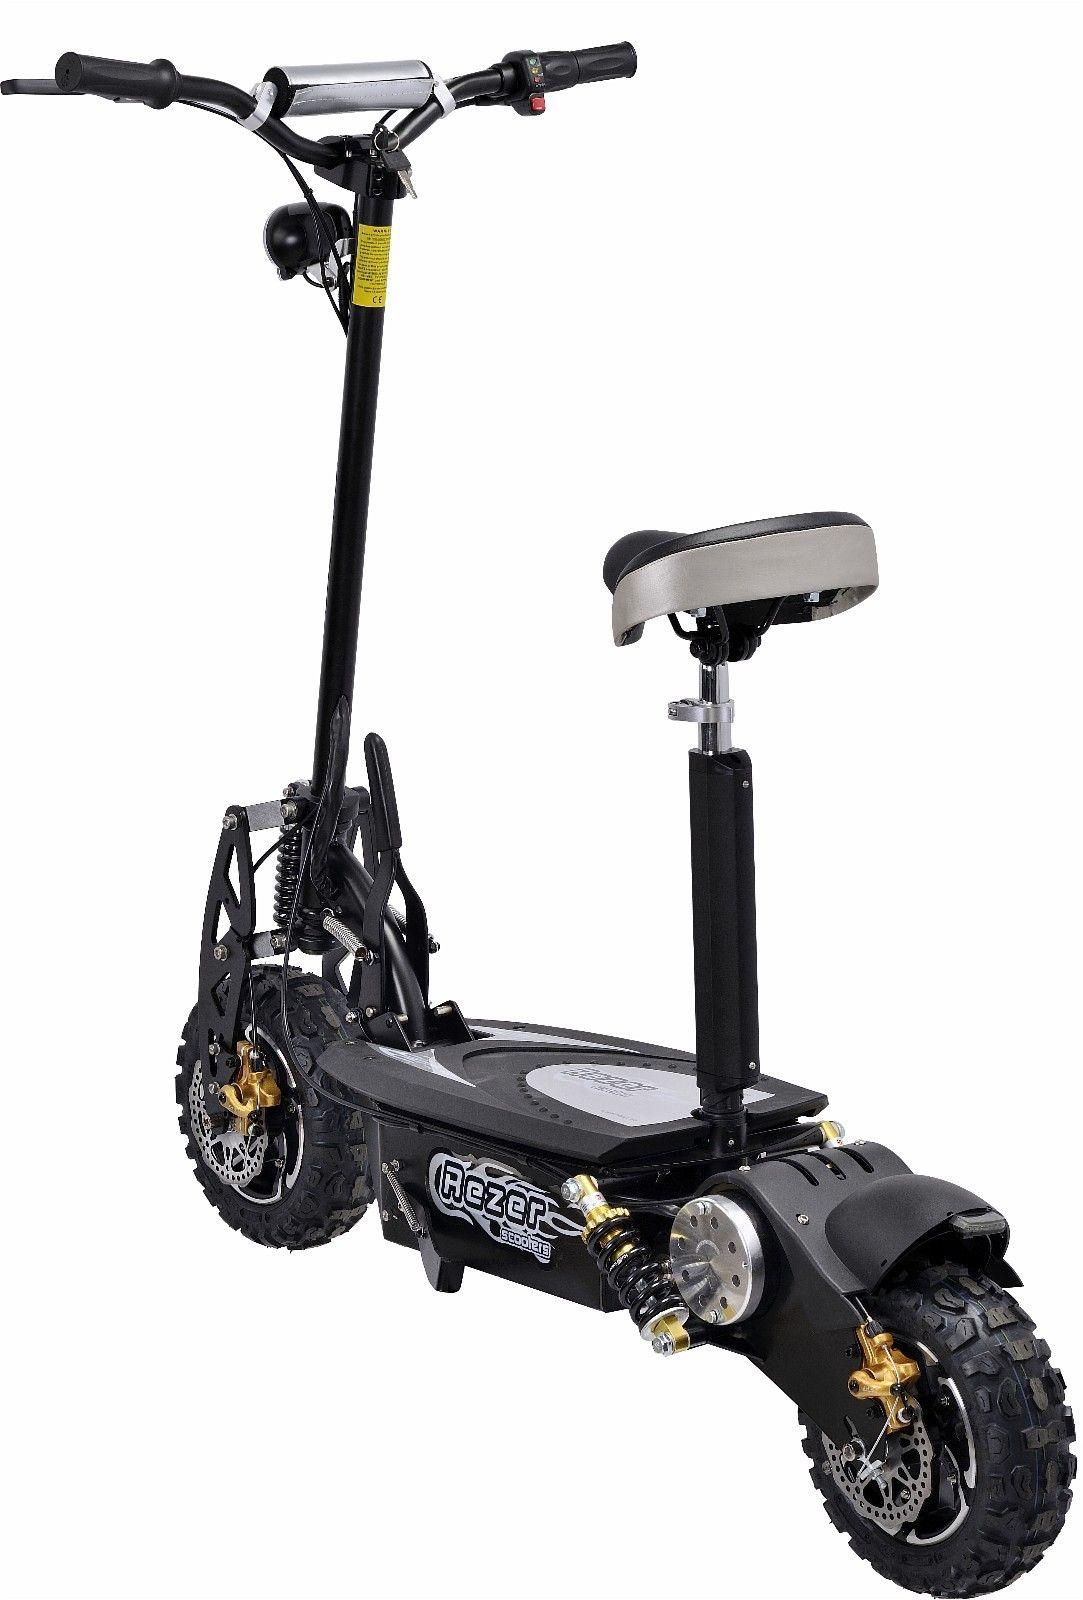 c2f415f29 1600W 48V Goped - Elektrisk scooter Rezer | FINN.no